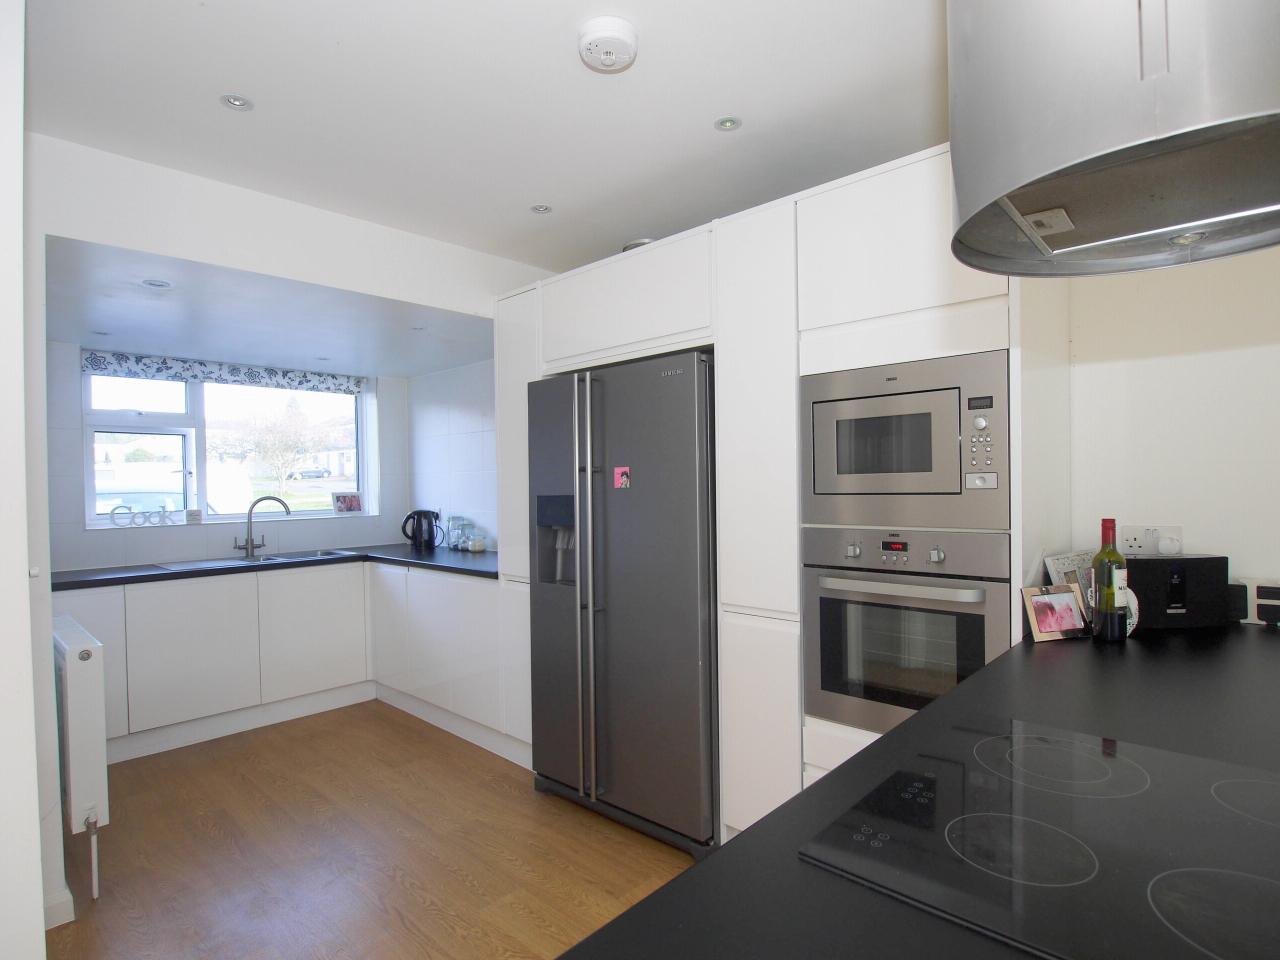 3 bedroom mid terraced house Sold in Sevenoaks - Photograph 3